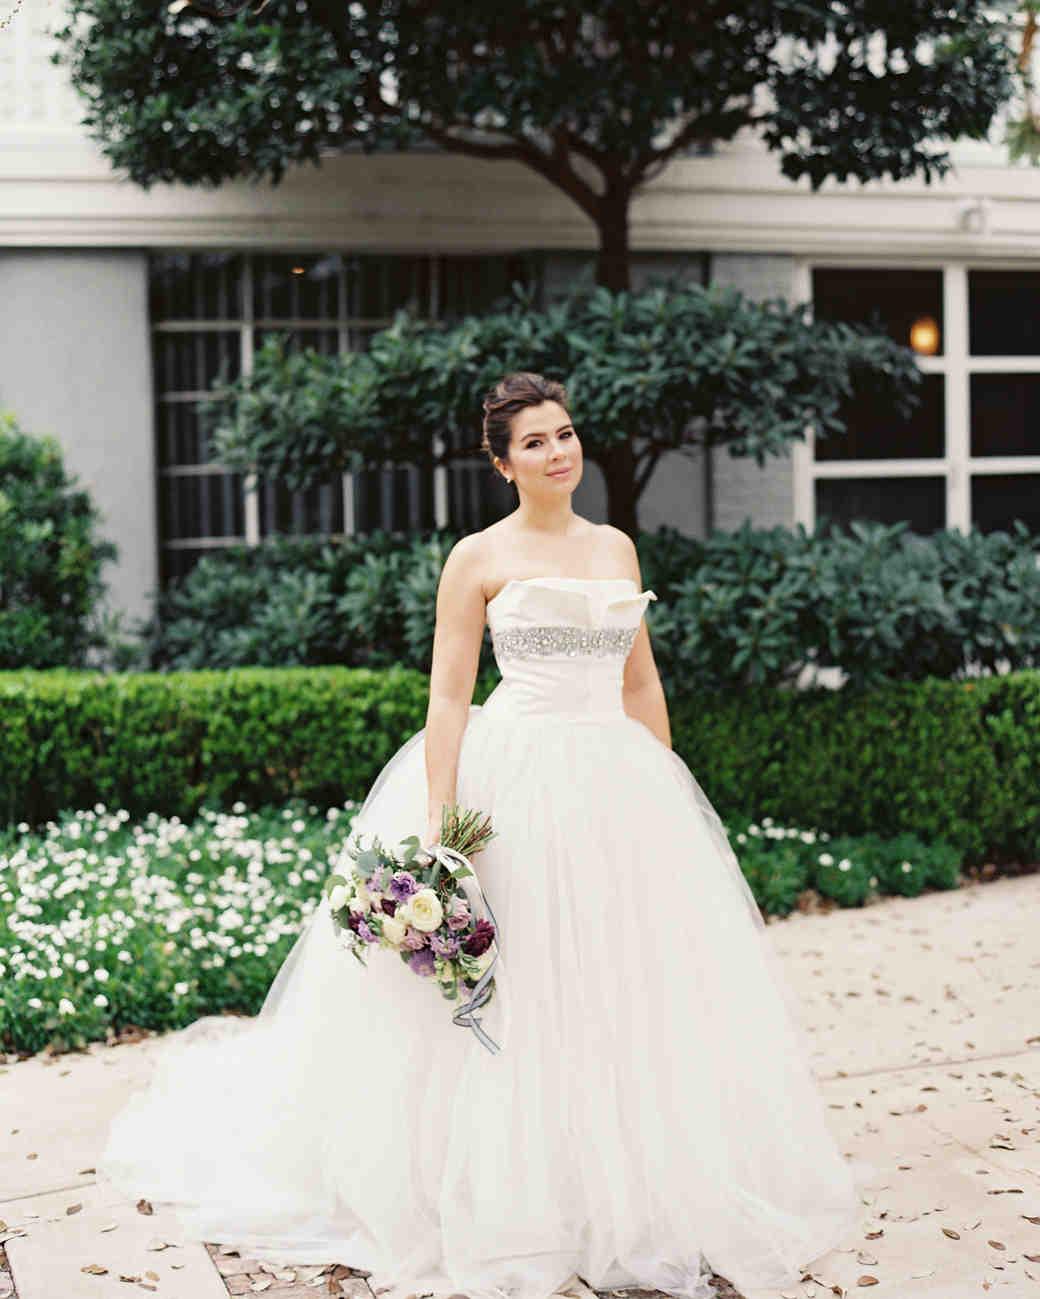 stacey-adam-wedding-bride-0018-s112112-0815.jpg